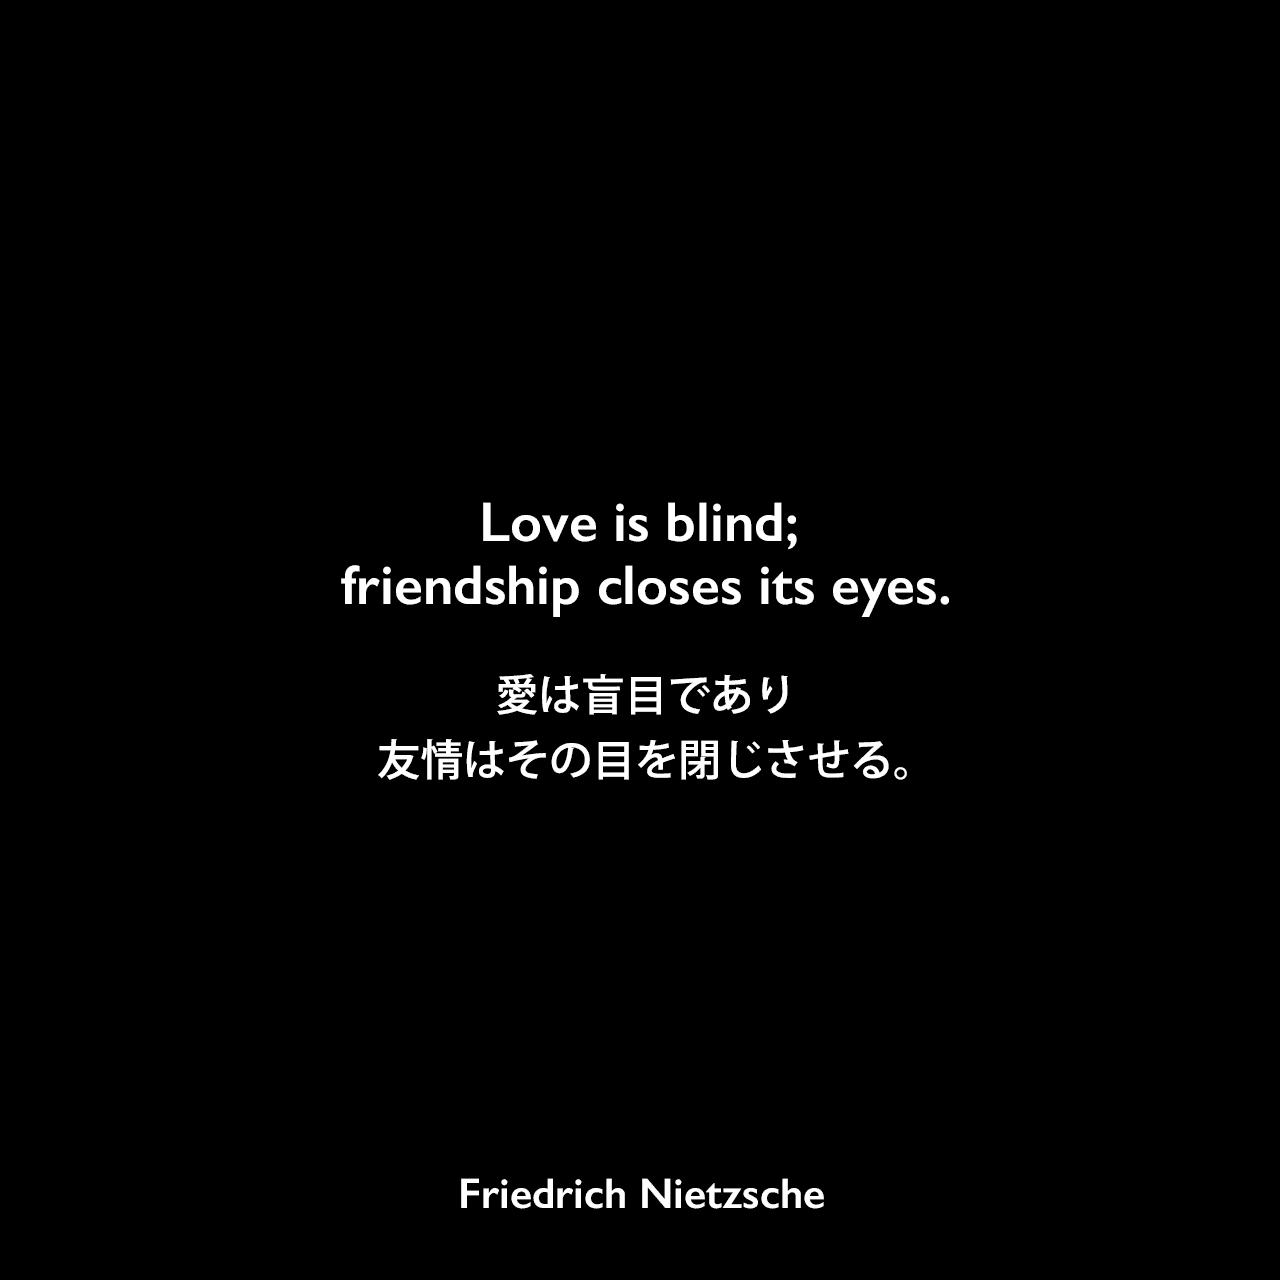 Love is blind; friendship closes its eyes.愛は盲目であり、 友情はその目を閉じさせる。